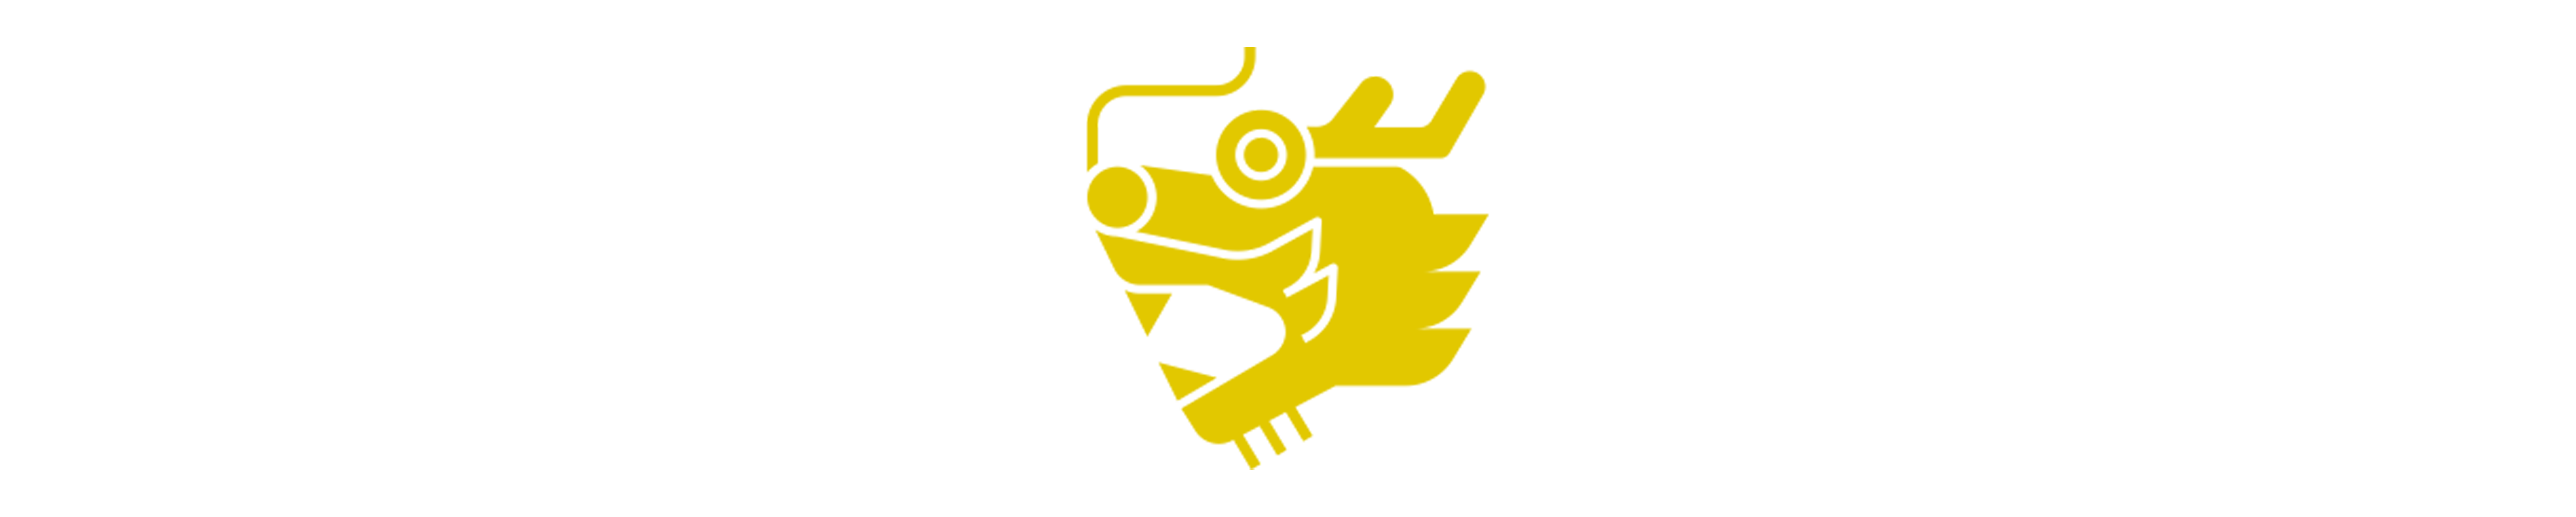 dragon jewels logo